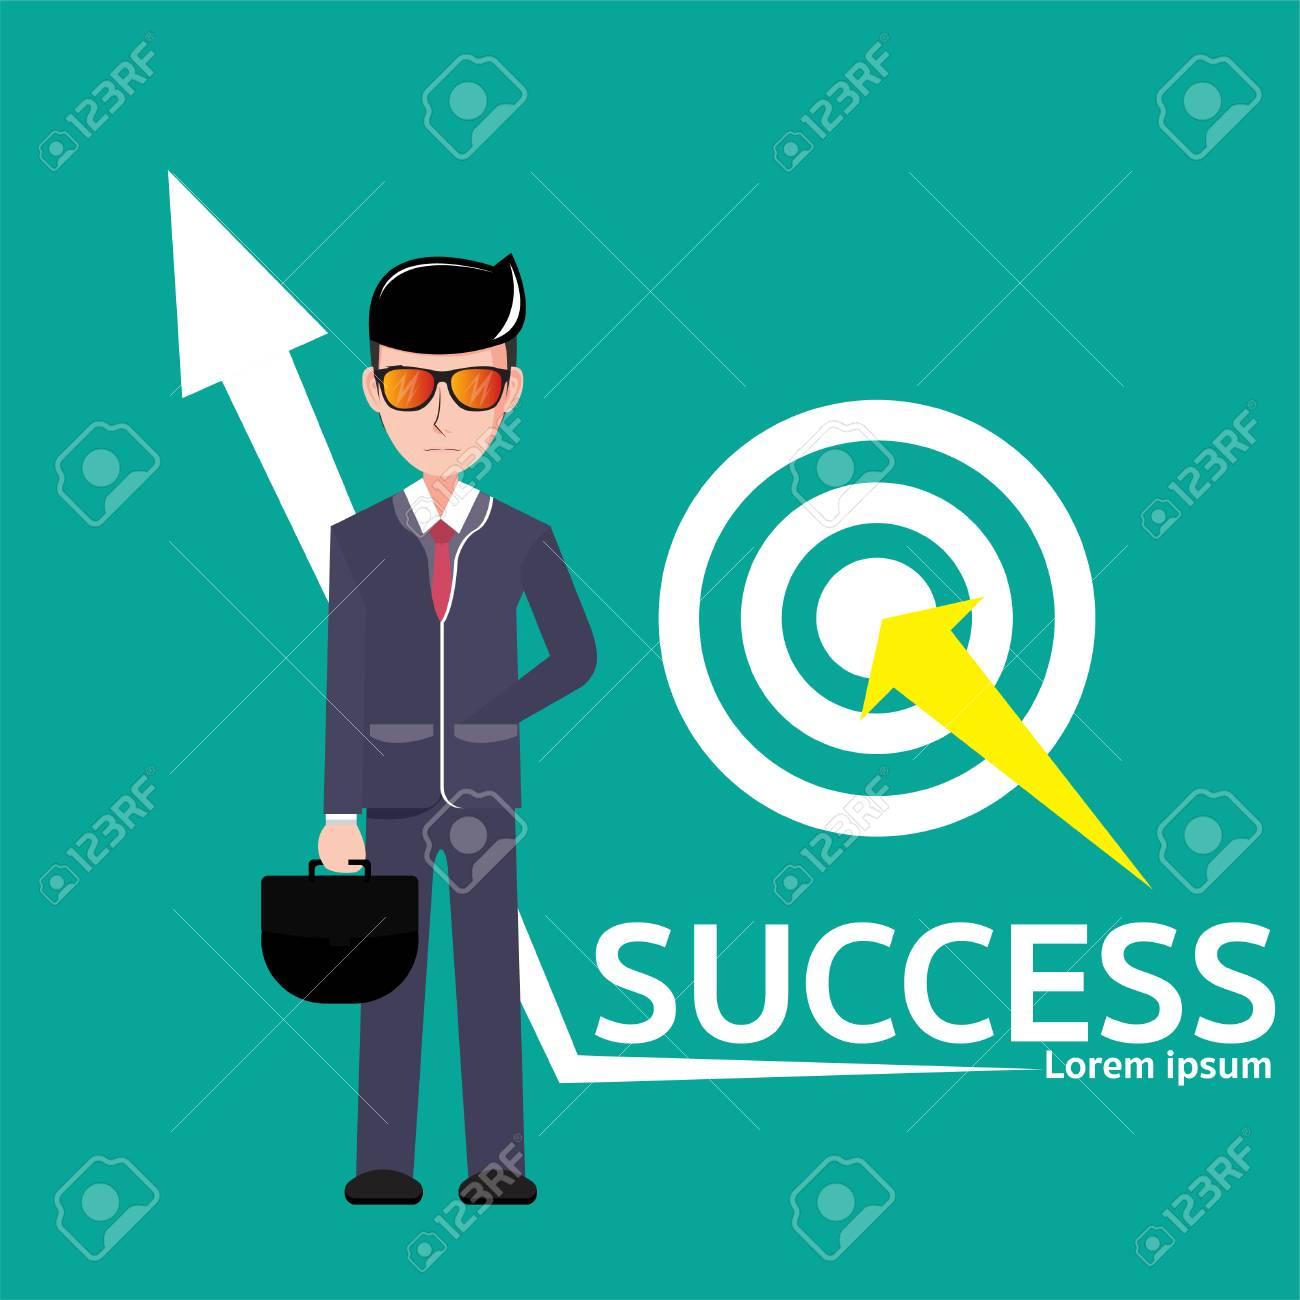 businessmen of columns column Business ideas about goals, accomplishments, achievements, and challenges. Vector Illustration - 109626488